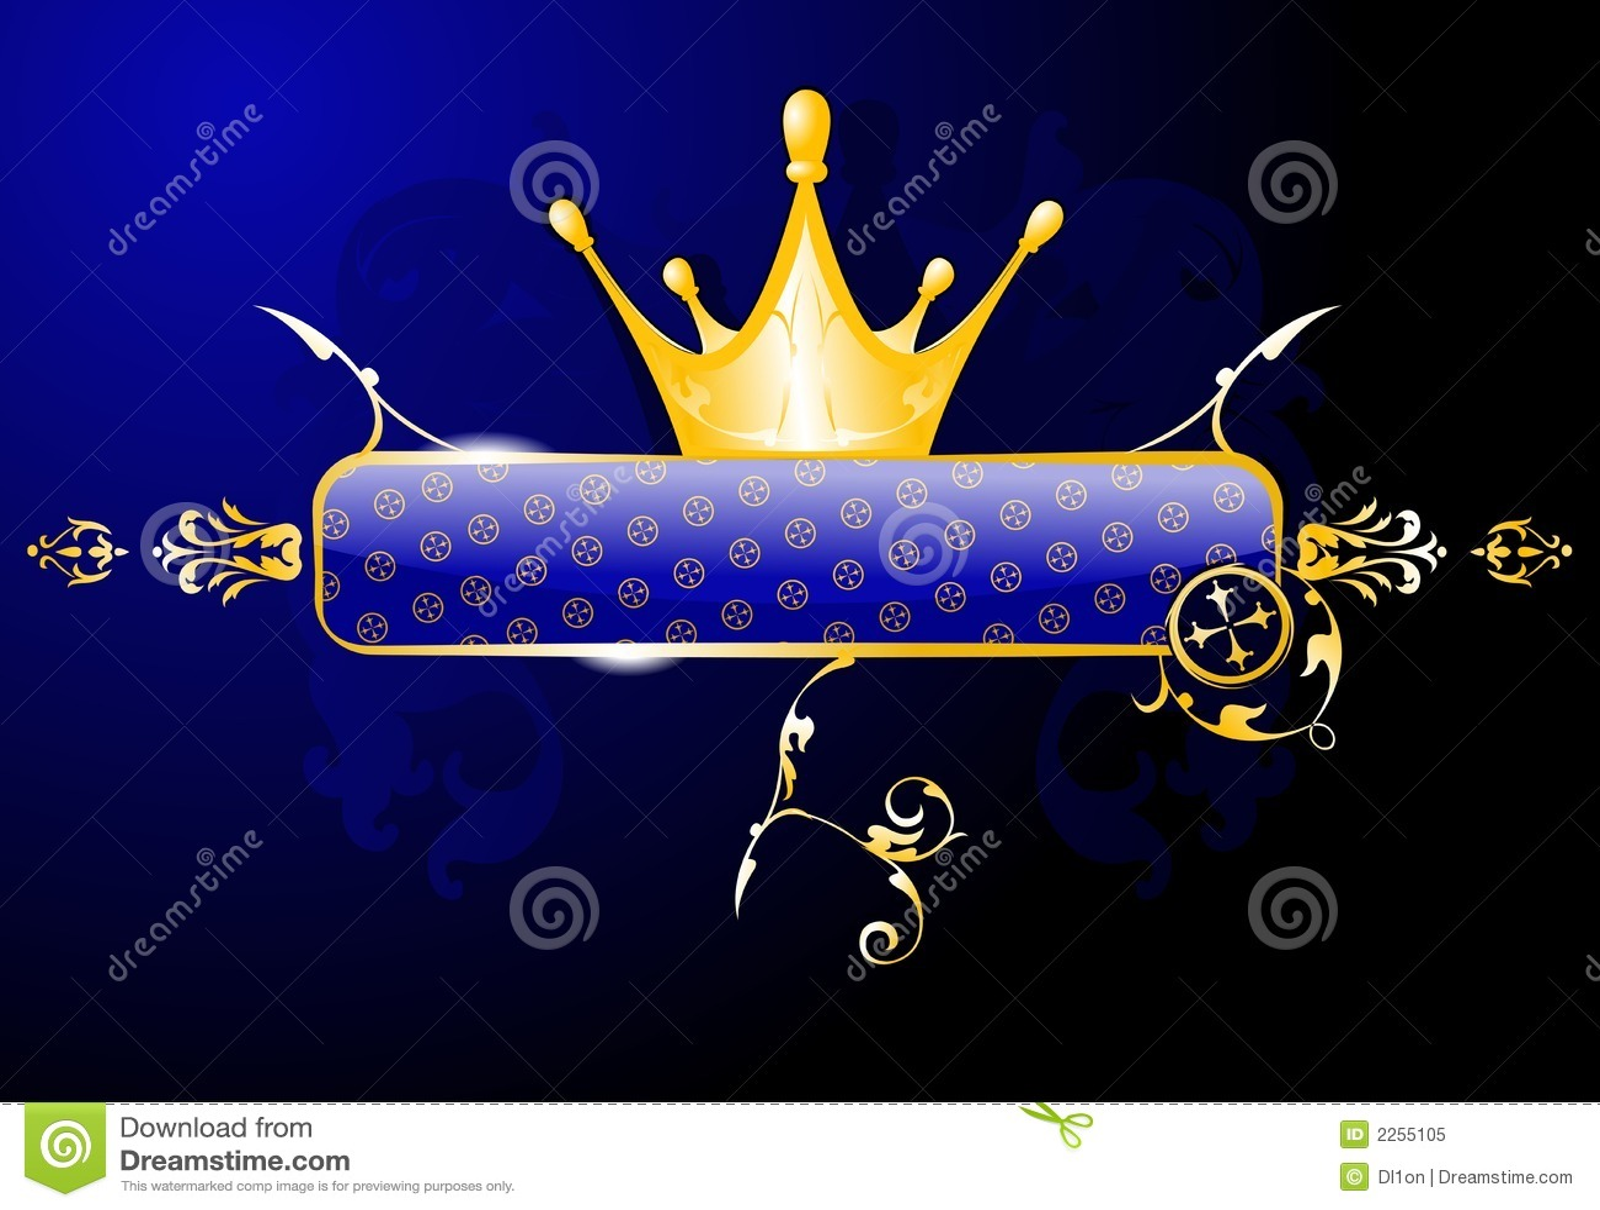 Goldkronen-Glühen-Blau-Fahne